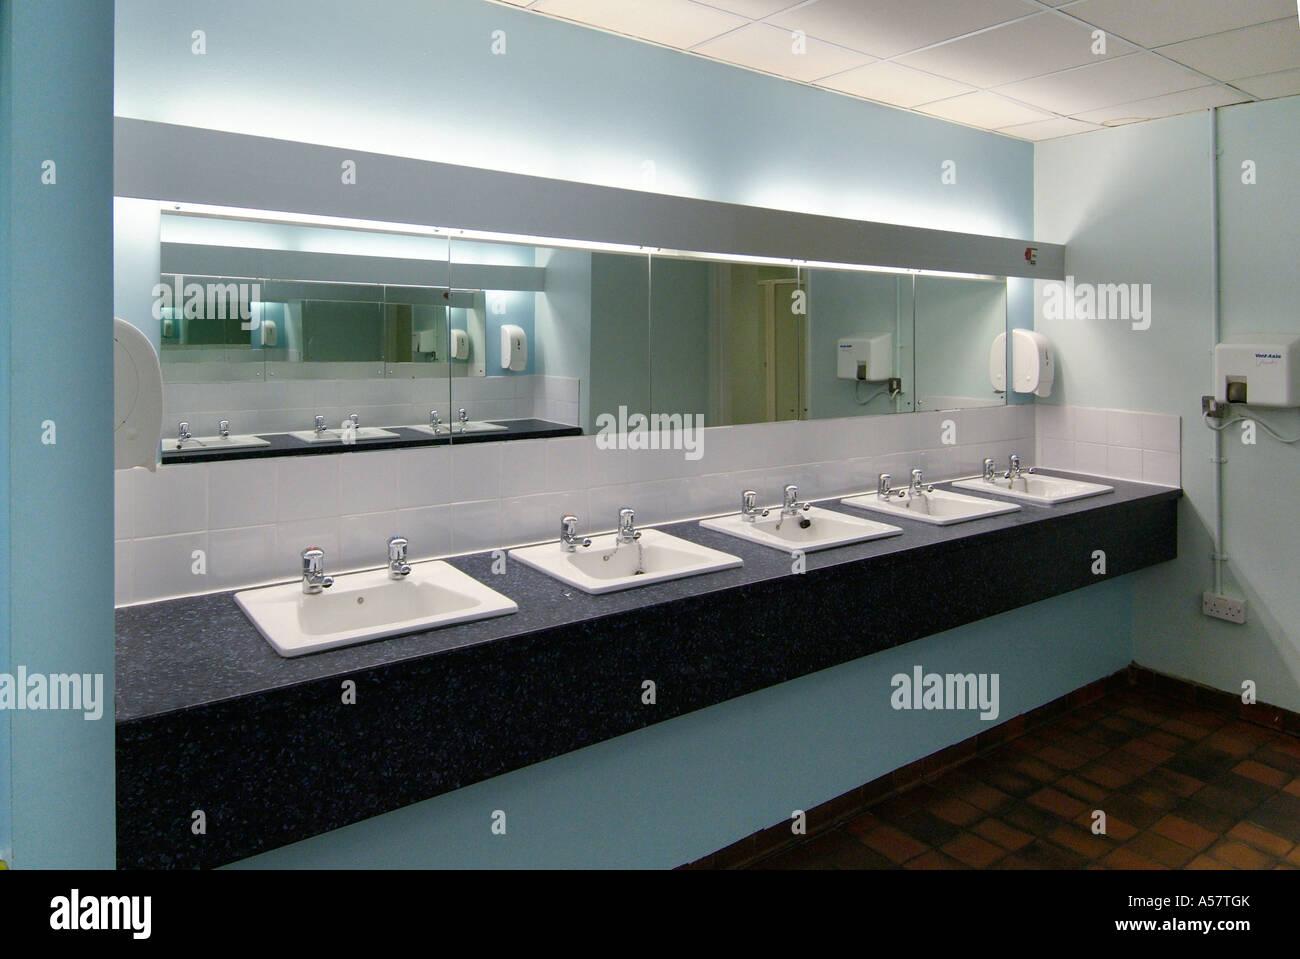 Washroom Taps : Washroom Public Hand Basin Porcelain Mirror Clean Ablution Toilet Tap ...